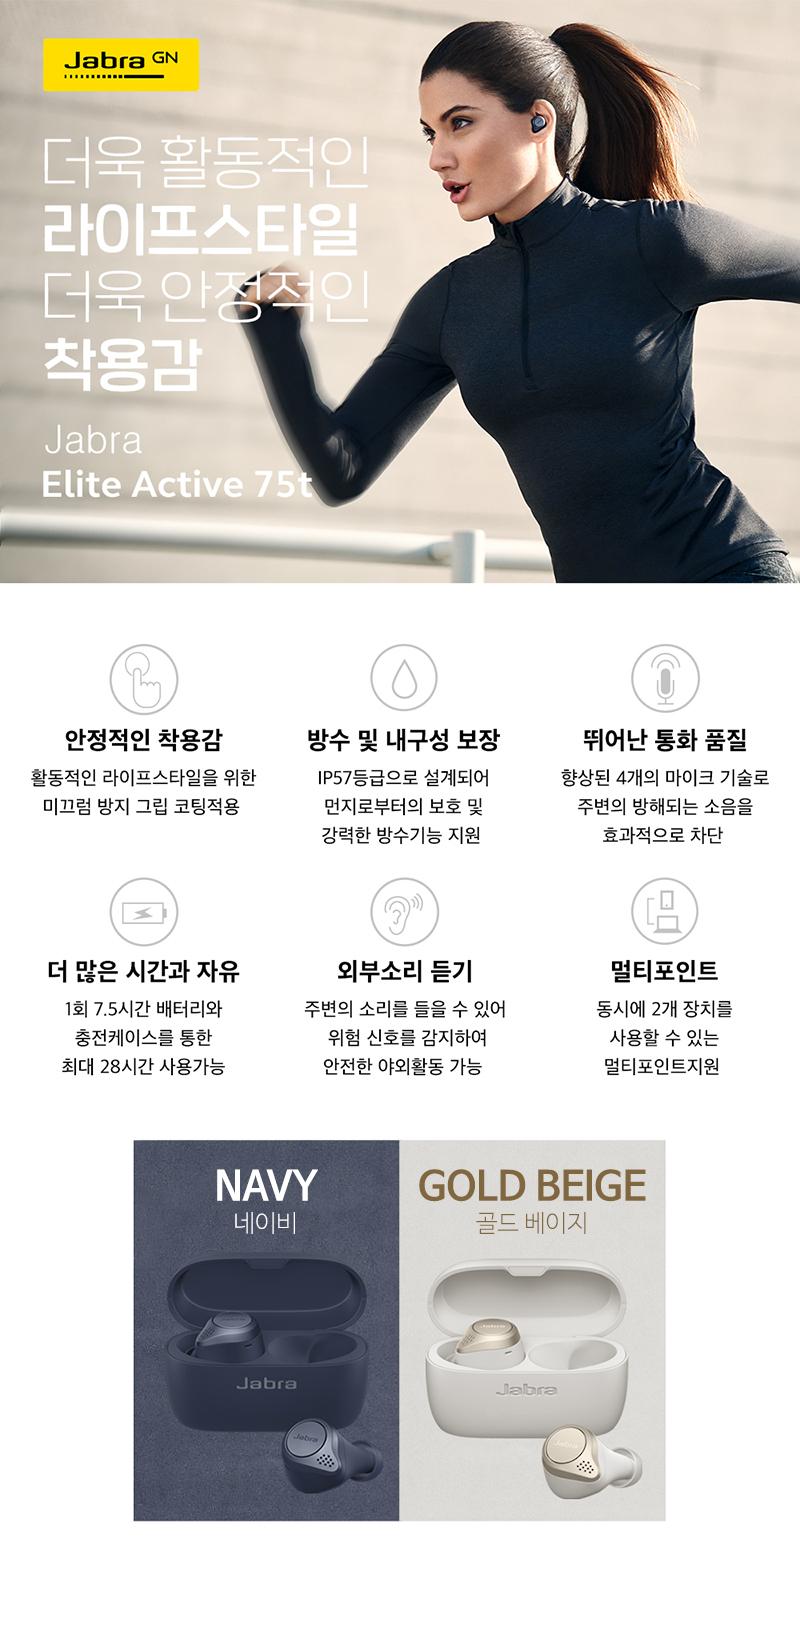 Elite-Active-75T-detail_색상보정_01.jpg